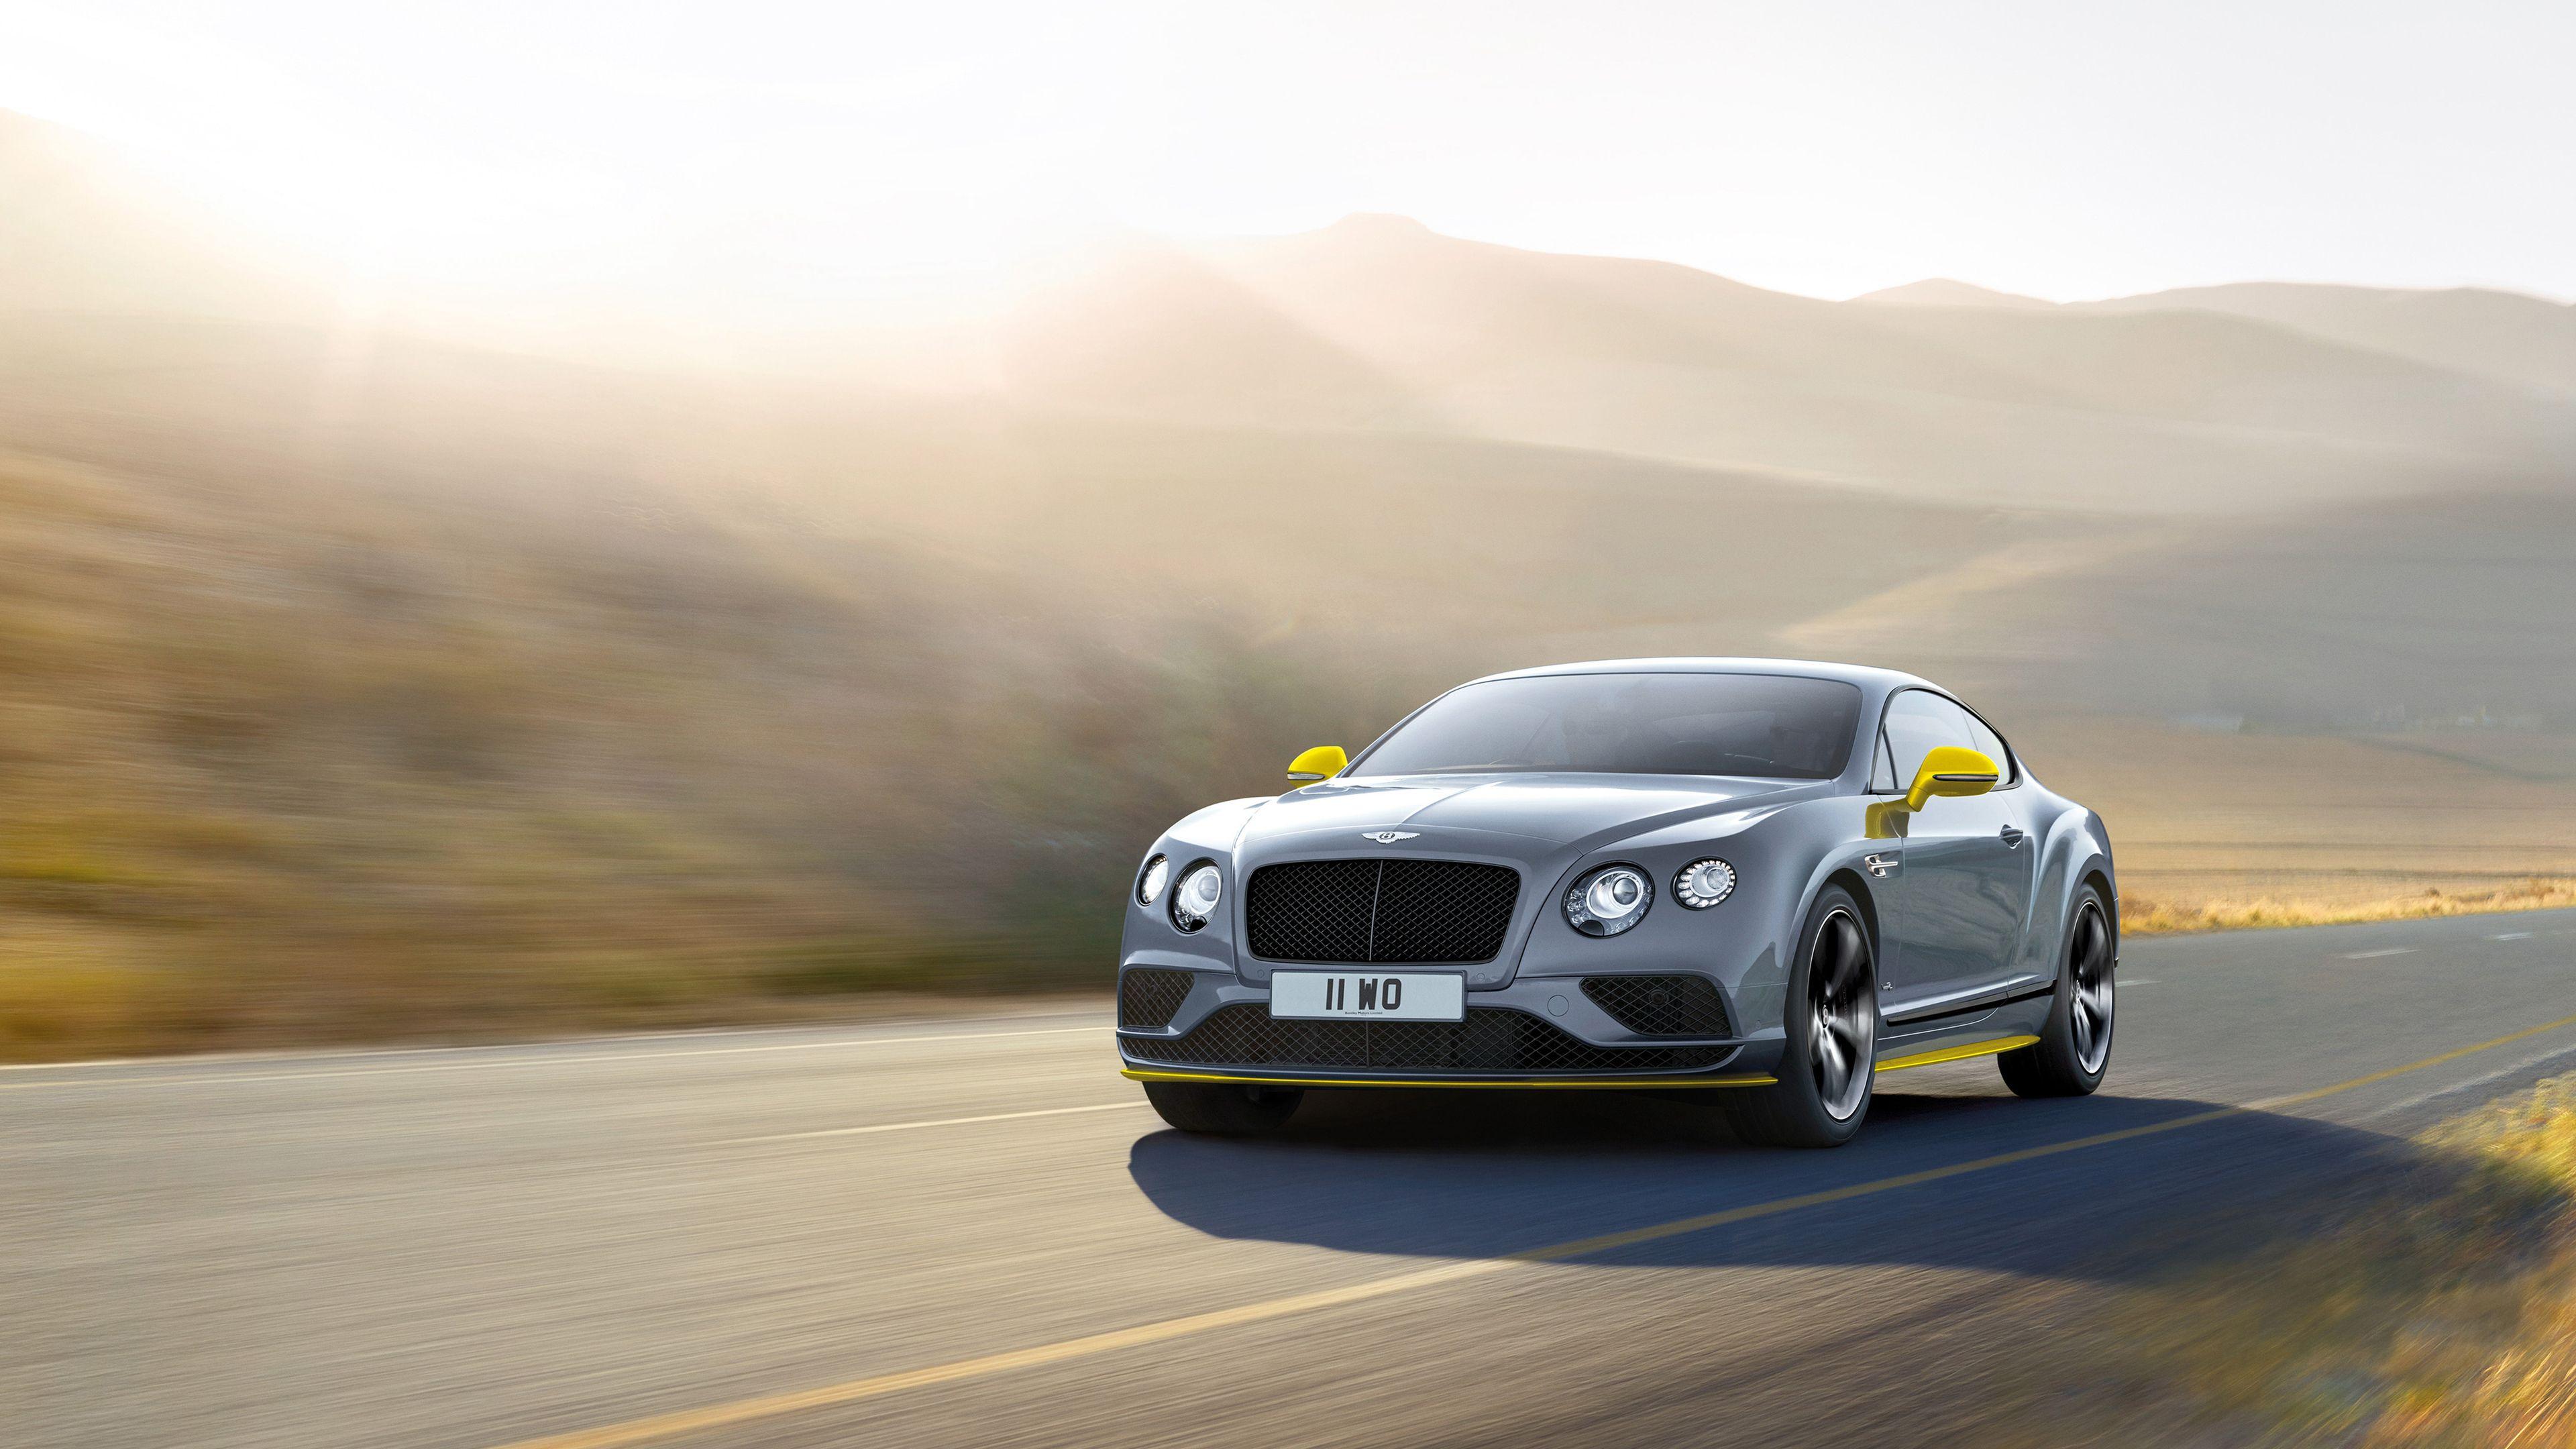 Bentley Continental 2018 4k Hd Wallpapers Cars Wallpapers